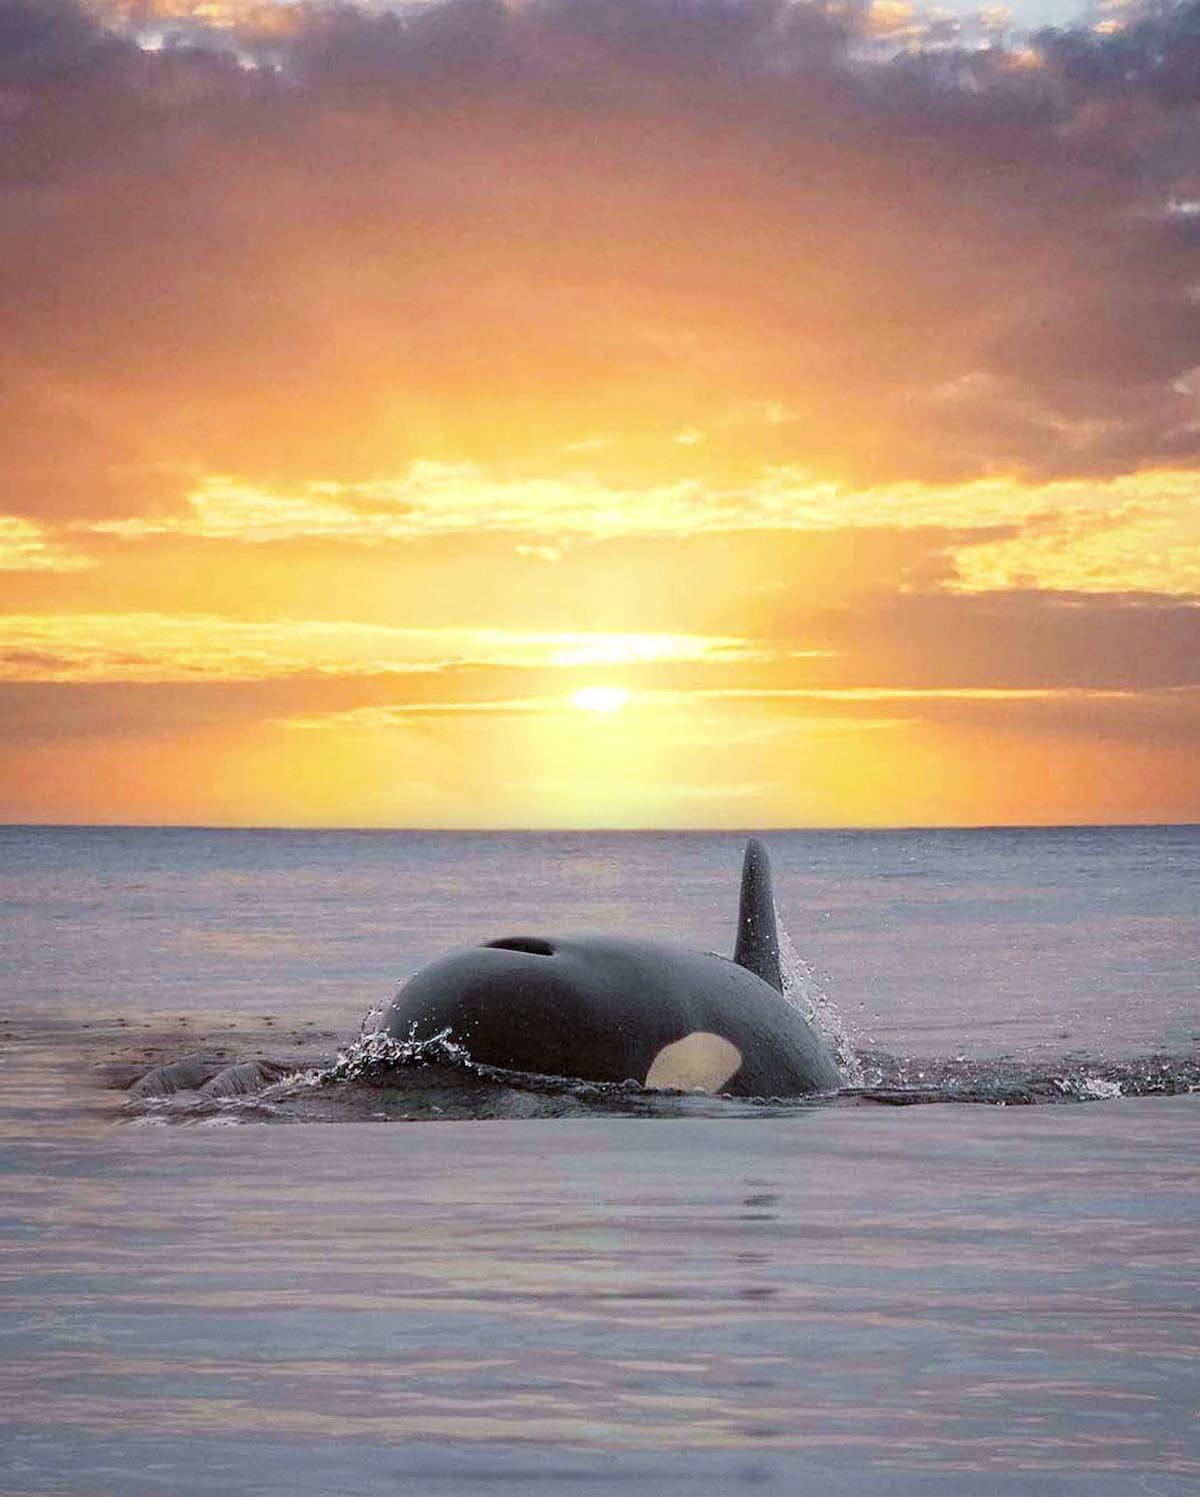 orca sunset marys mark photography 5